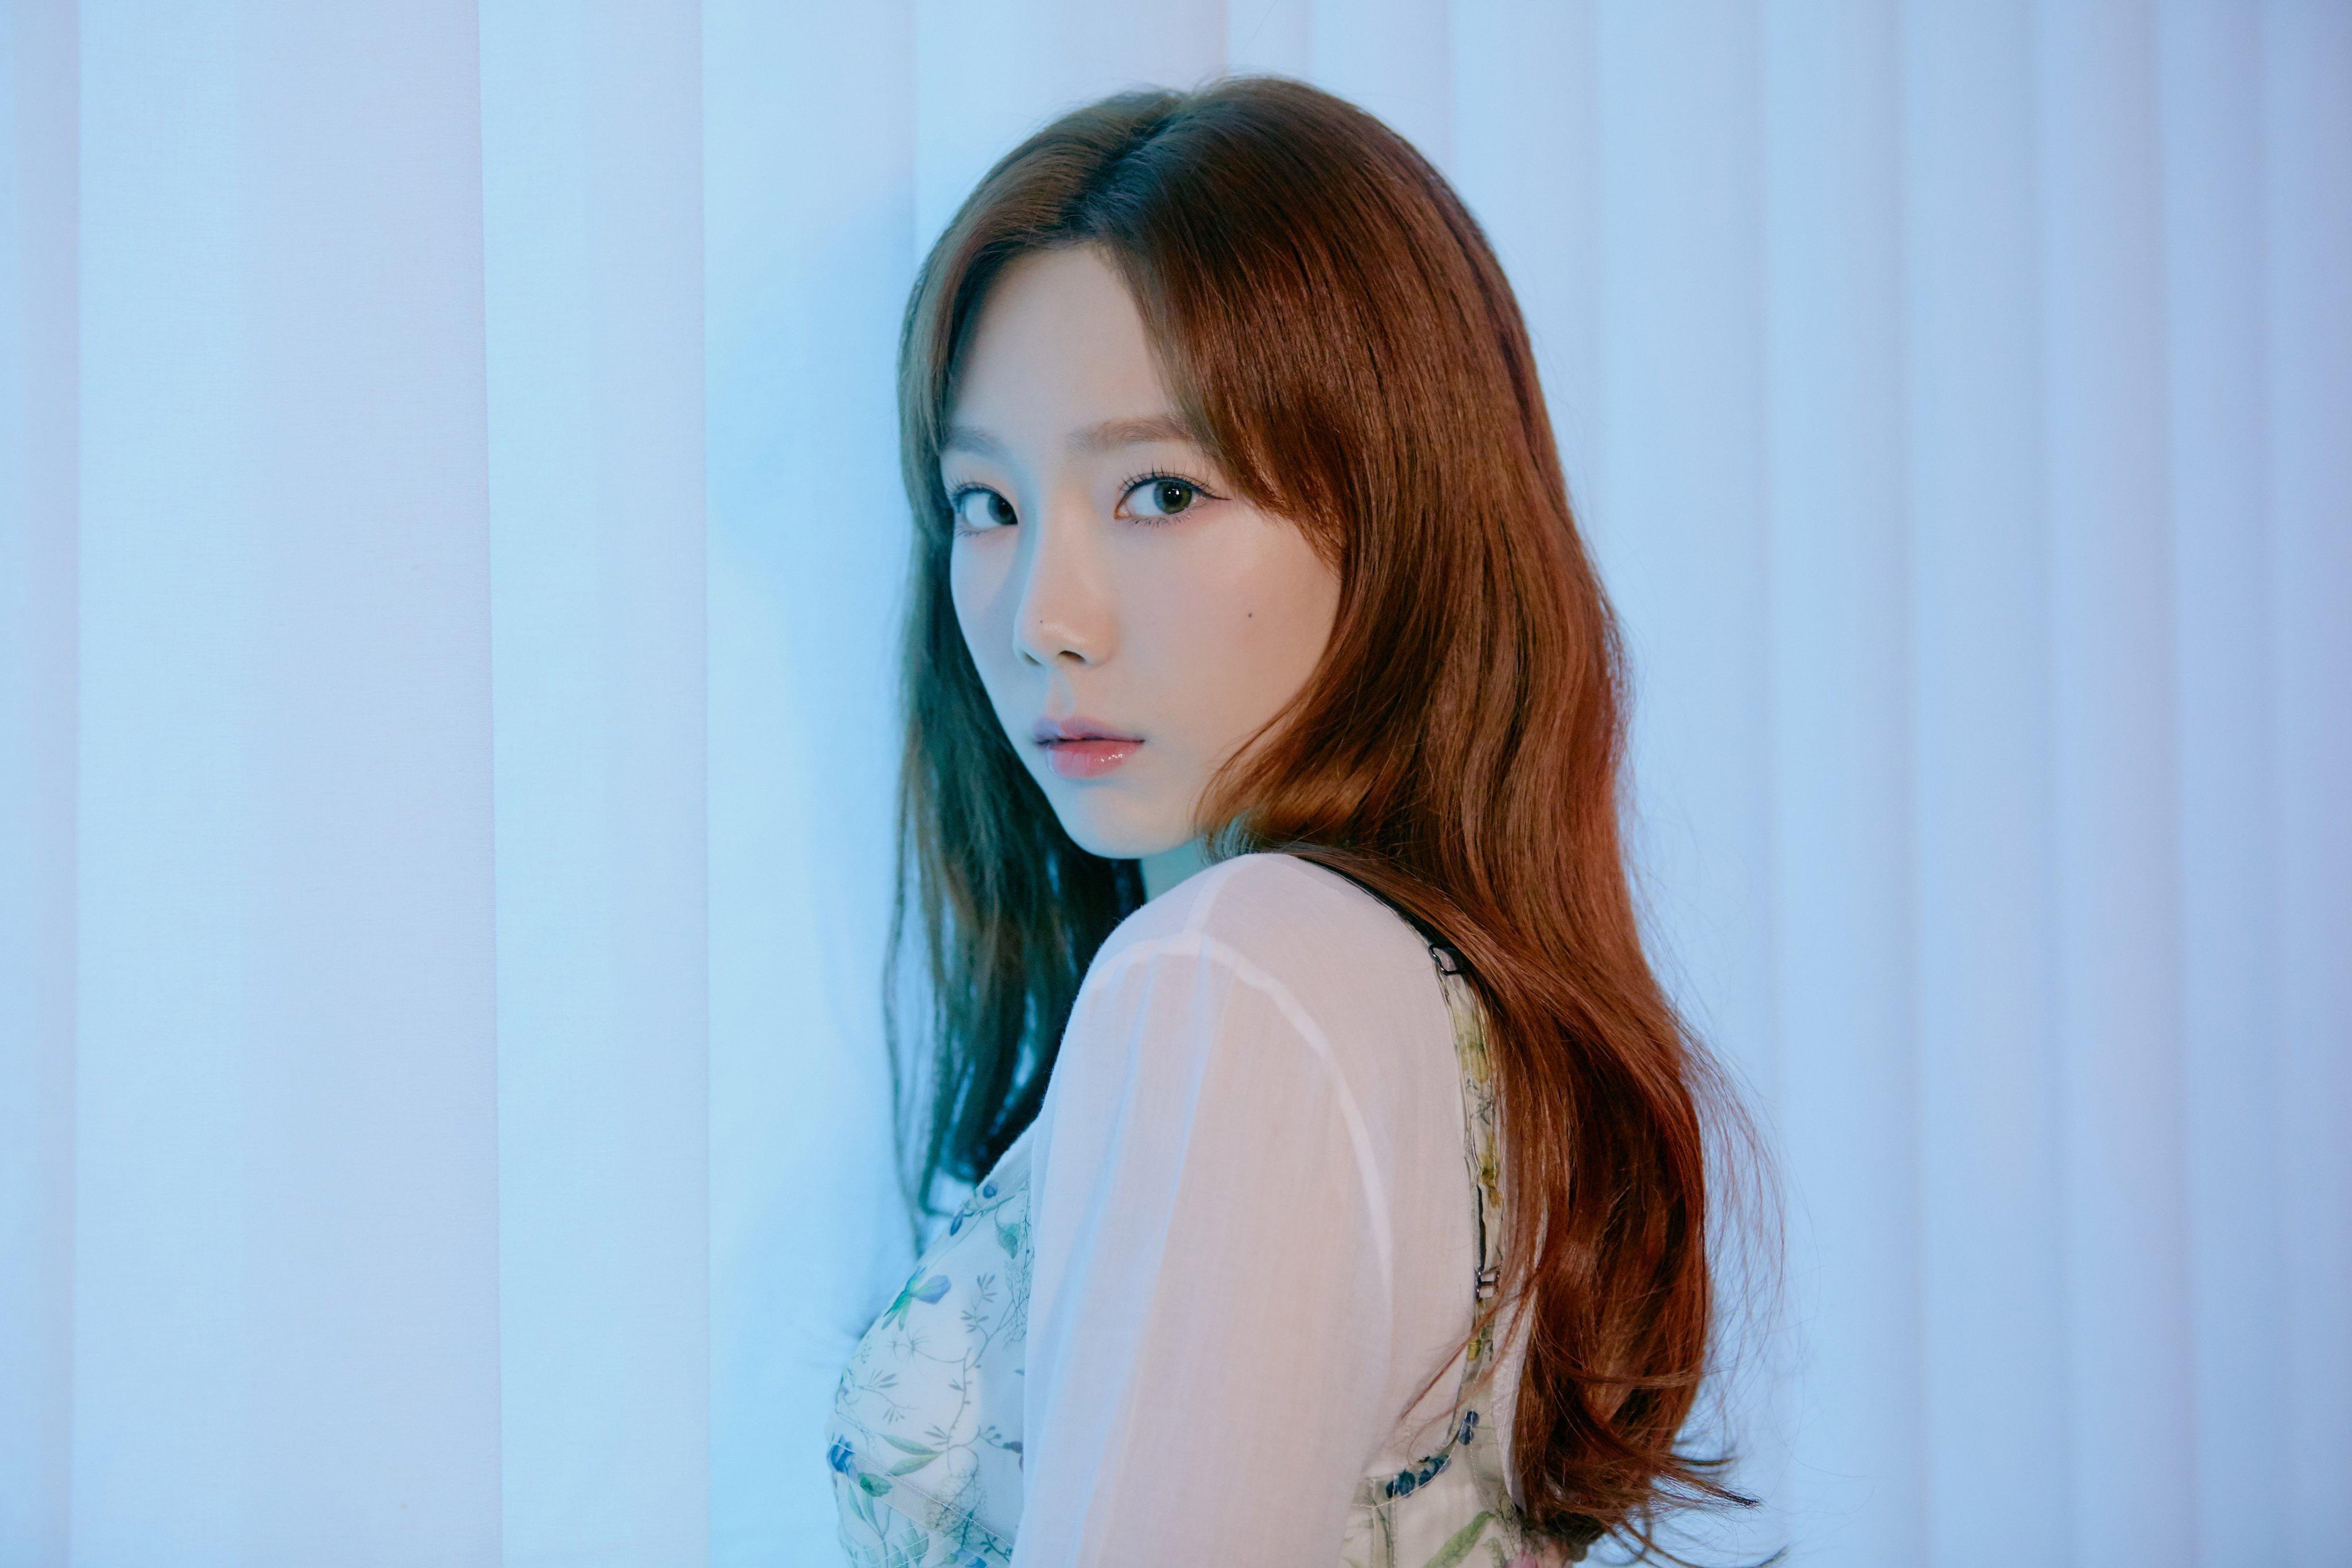 Tao hinh tre trung nhu moi doi muoi cua Tae Yeon hinh anh 8 ESYXwQSWsAYlhHy.jpg